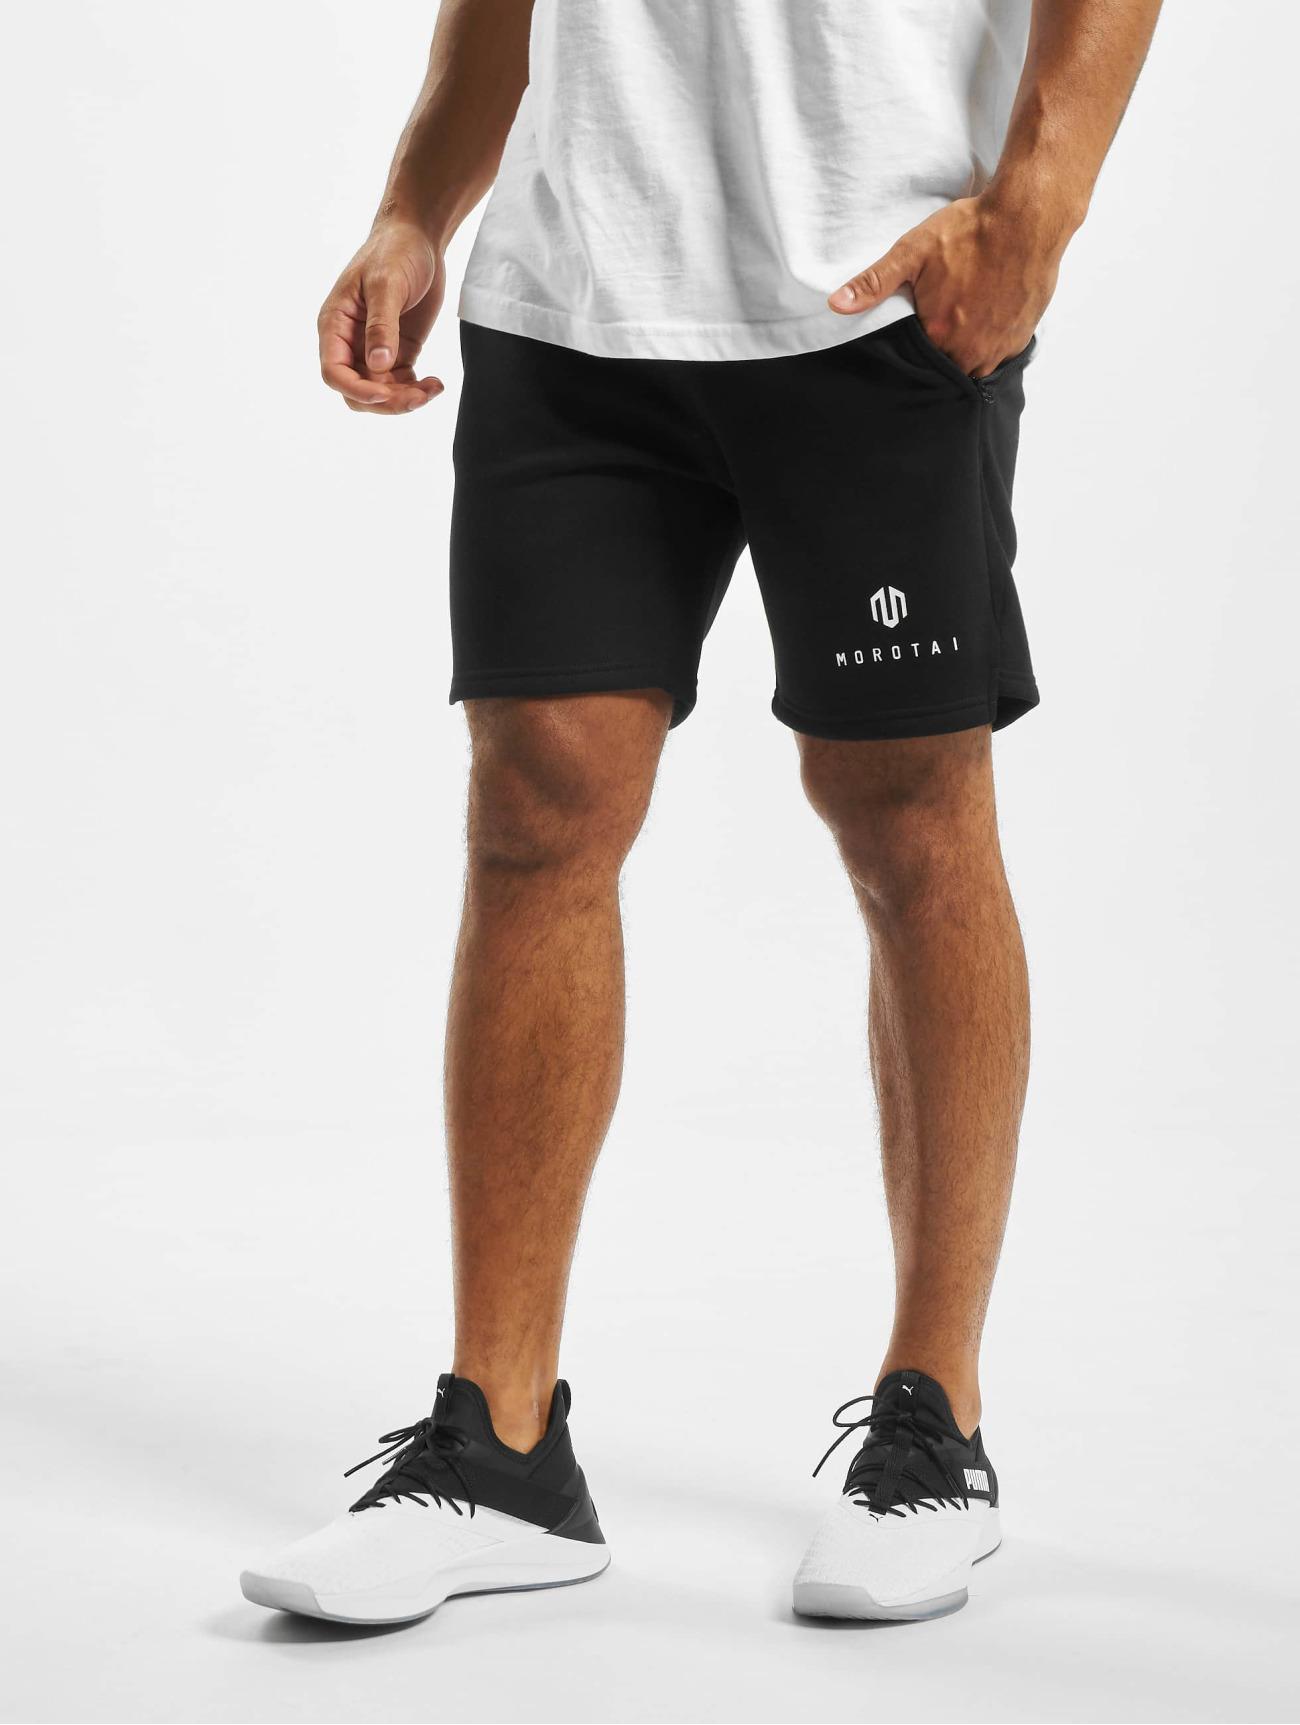 MOROTAI  NKMR Neotech  noir Homme Short  708985 Homme Pantalons & Shorts